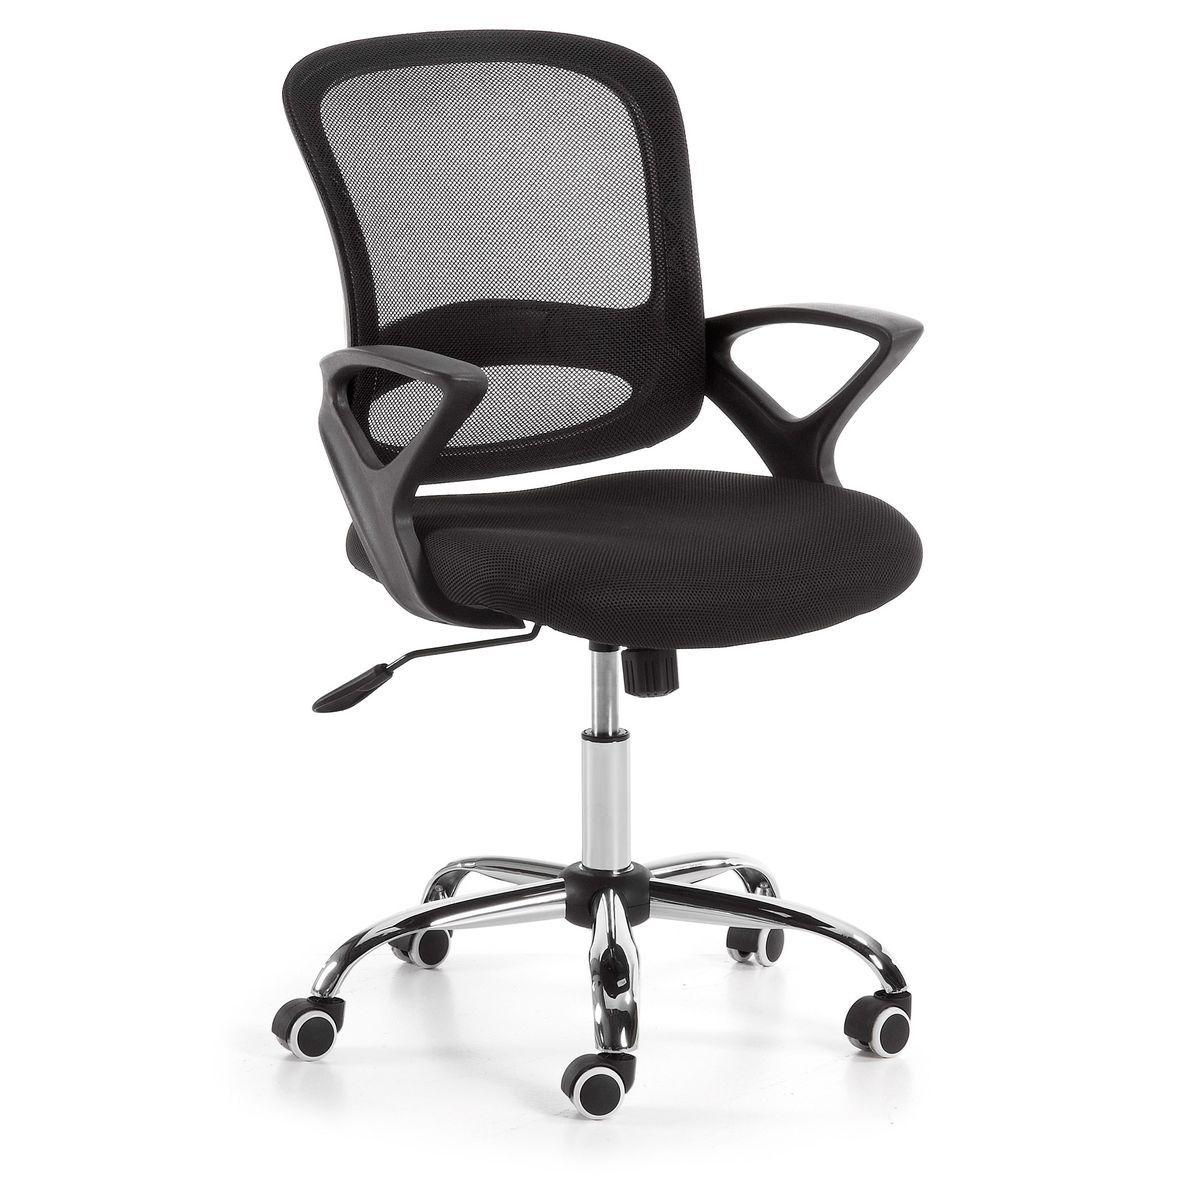 Chaise De Bureau Tangier Chaise Bureau Chaise Coussin Chaise